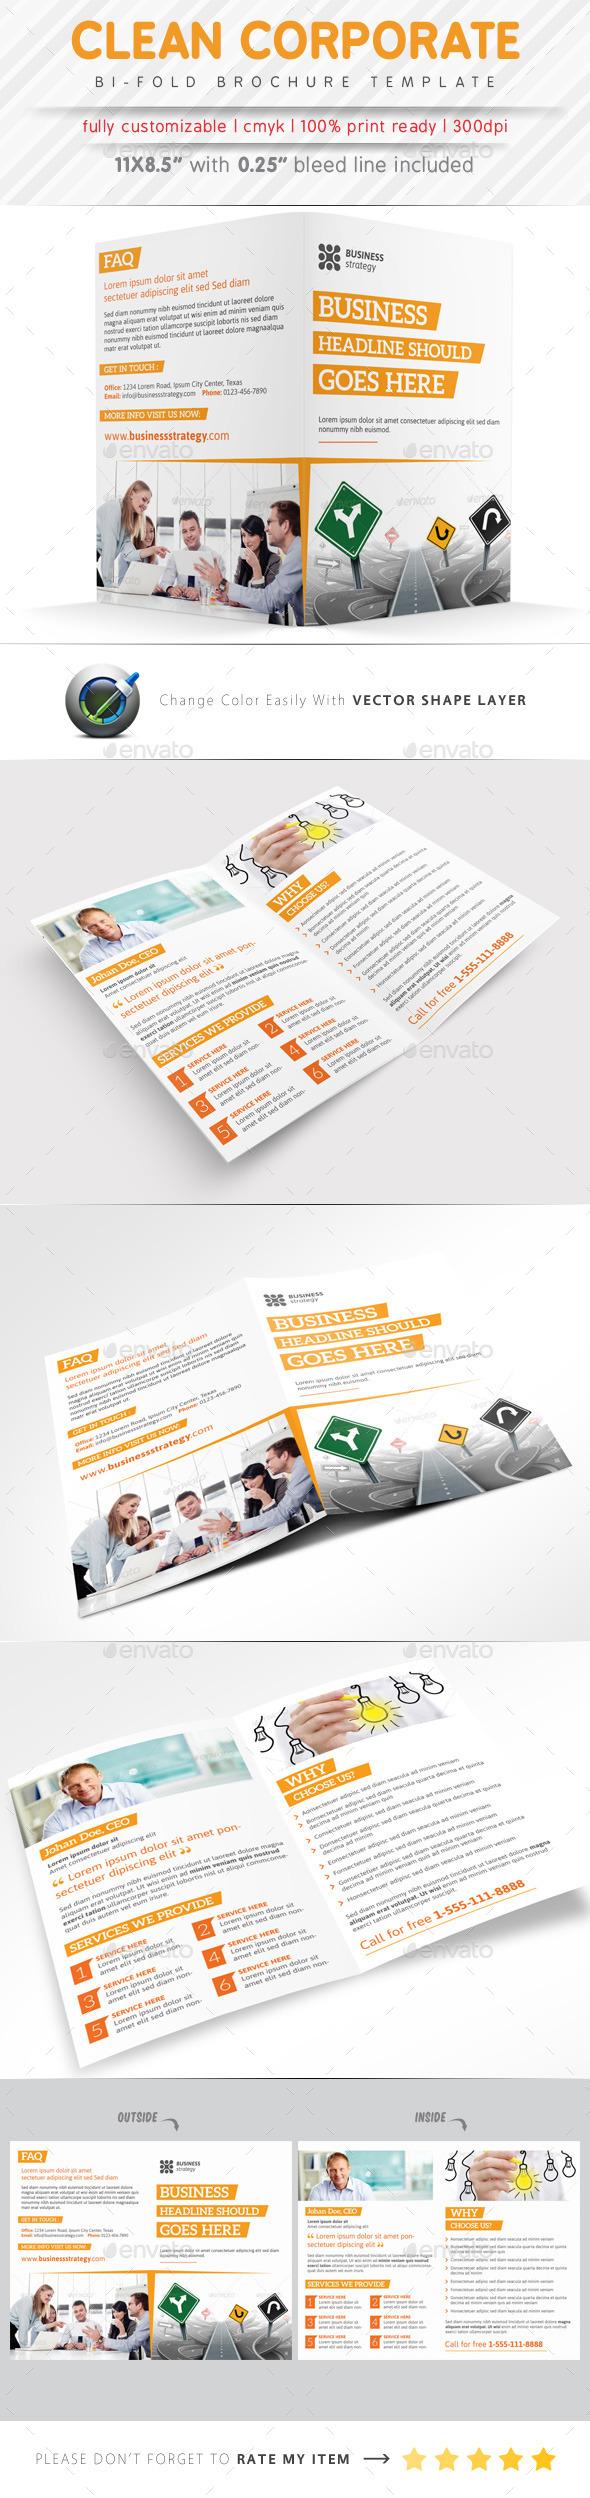 Clean Corporate Bi Fold Brochure - Corporate Brochures